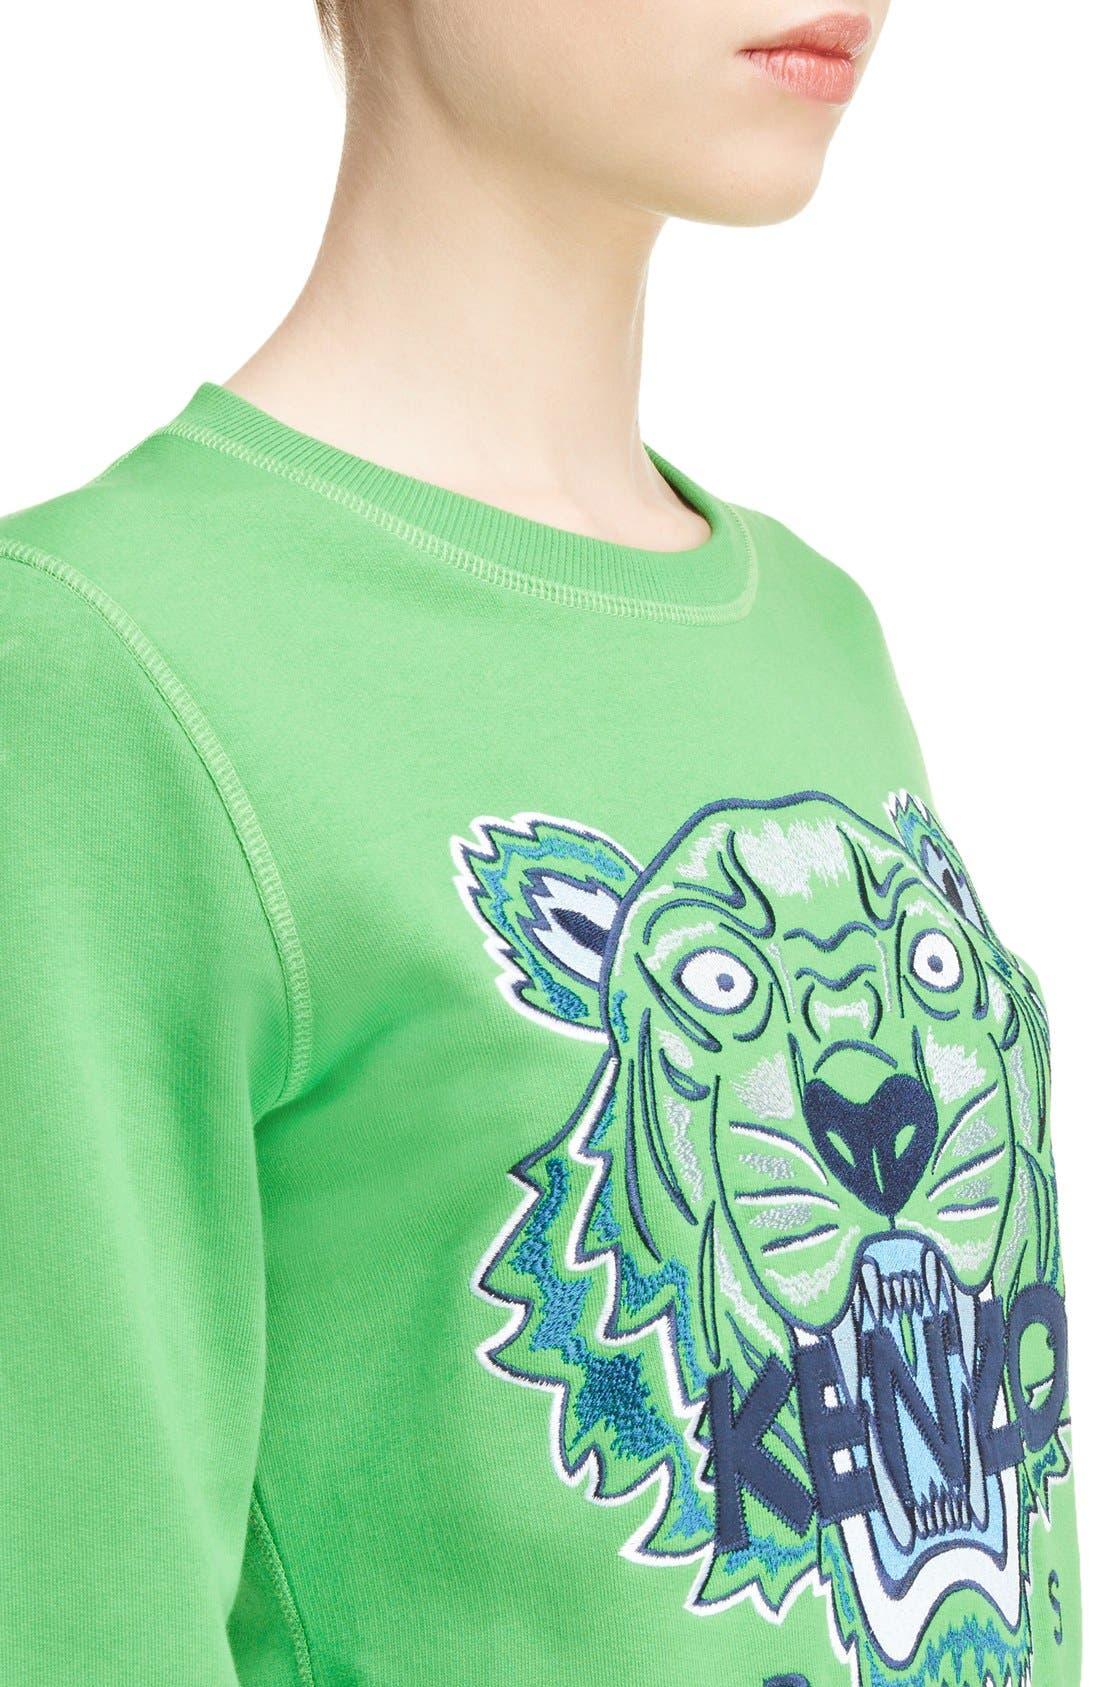 Embroidered Tiger Cotton Sweatshirt,                             Main thumbnail 1, color,                             311